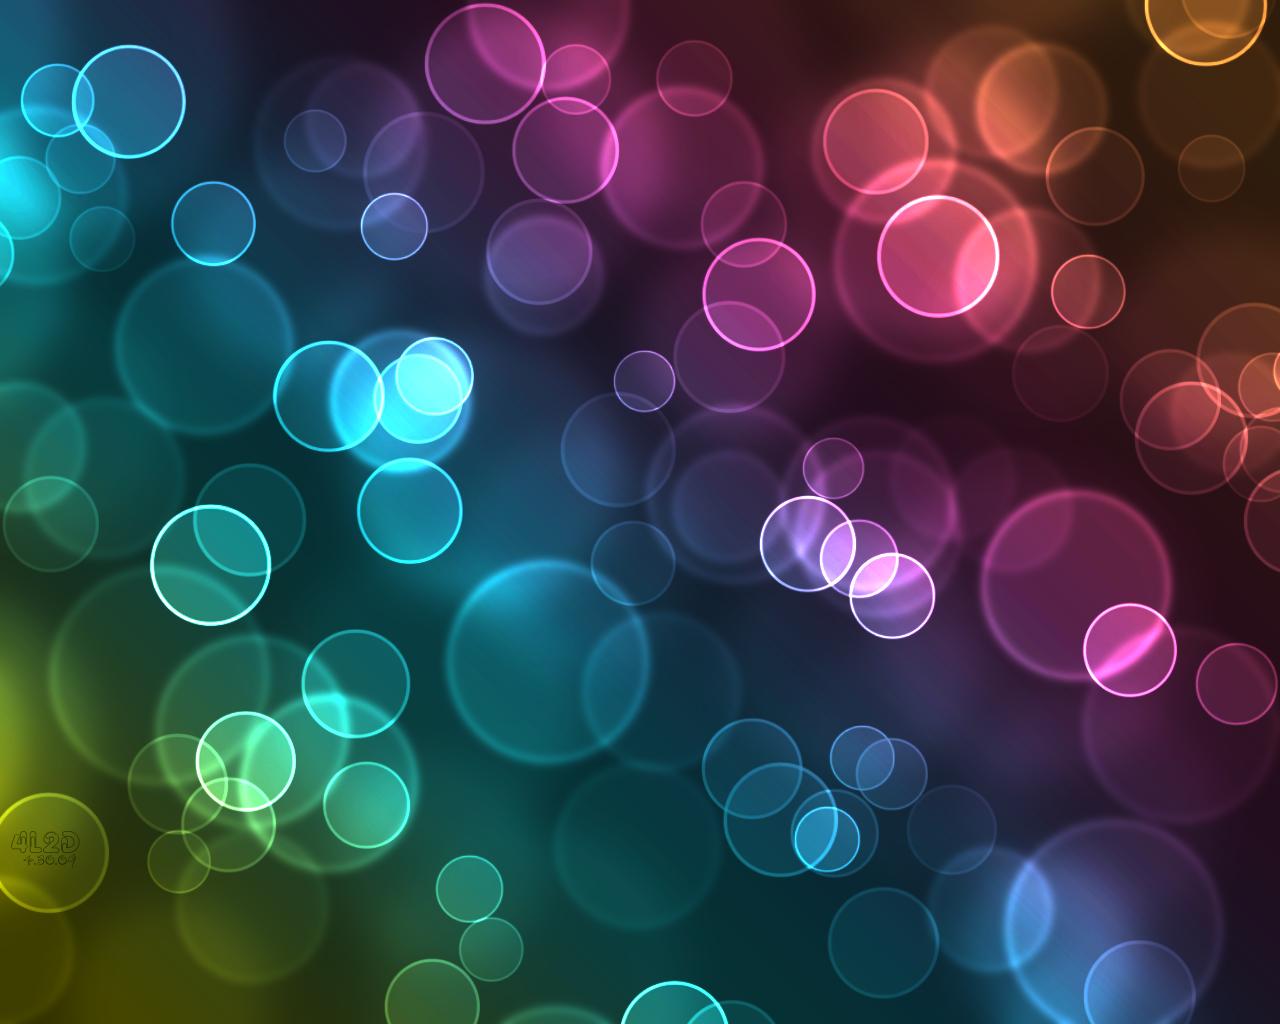 Bubble · Bubble · Bubble · Bubble ...